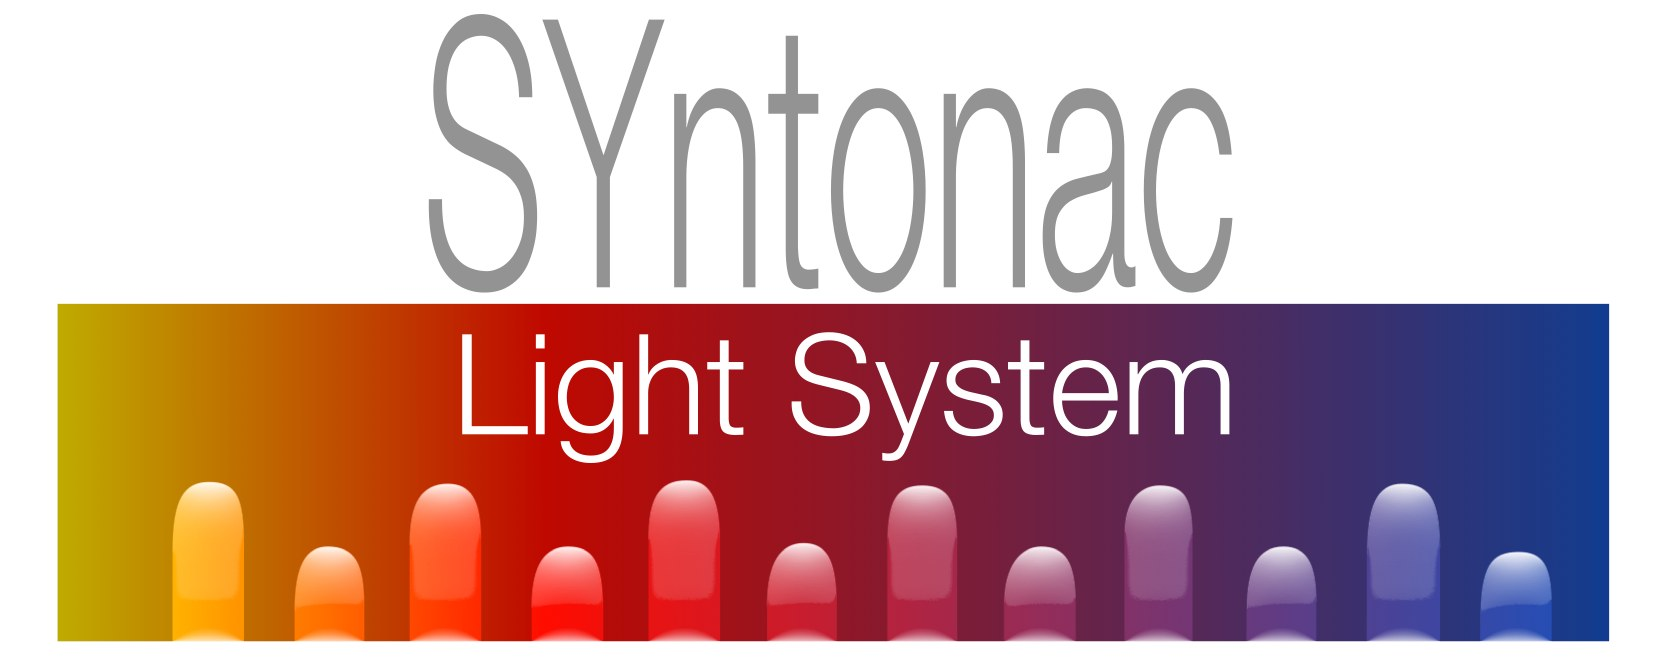 98SYntonac1.1.2.jpg